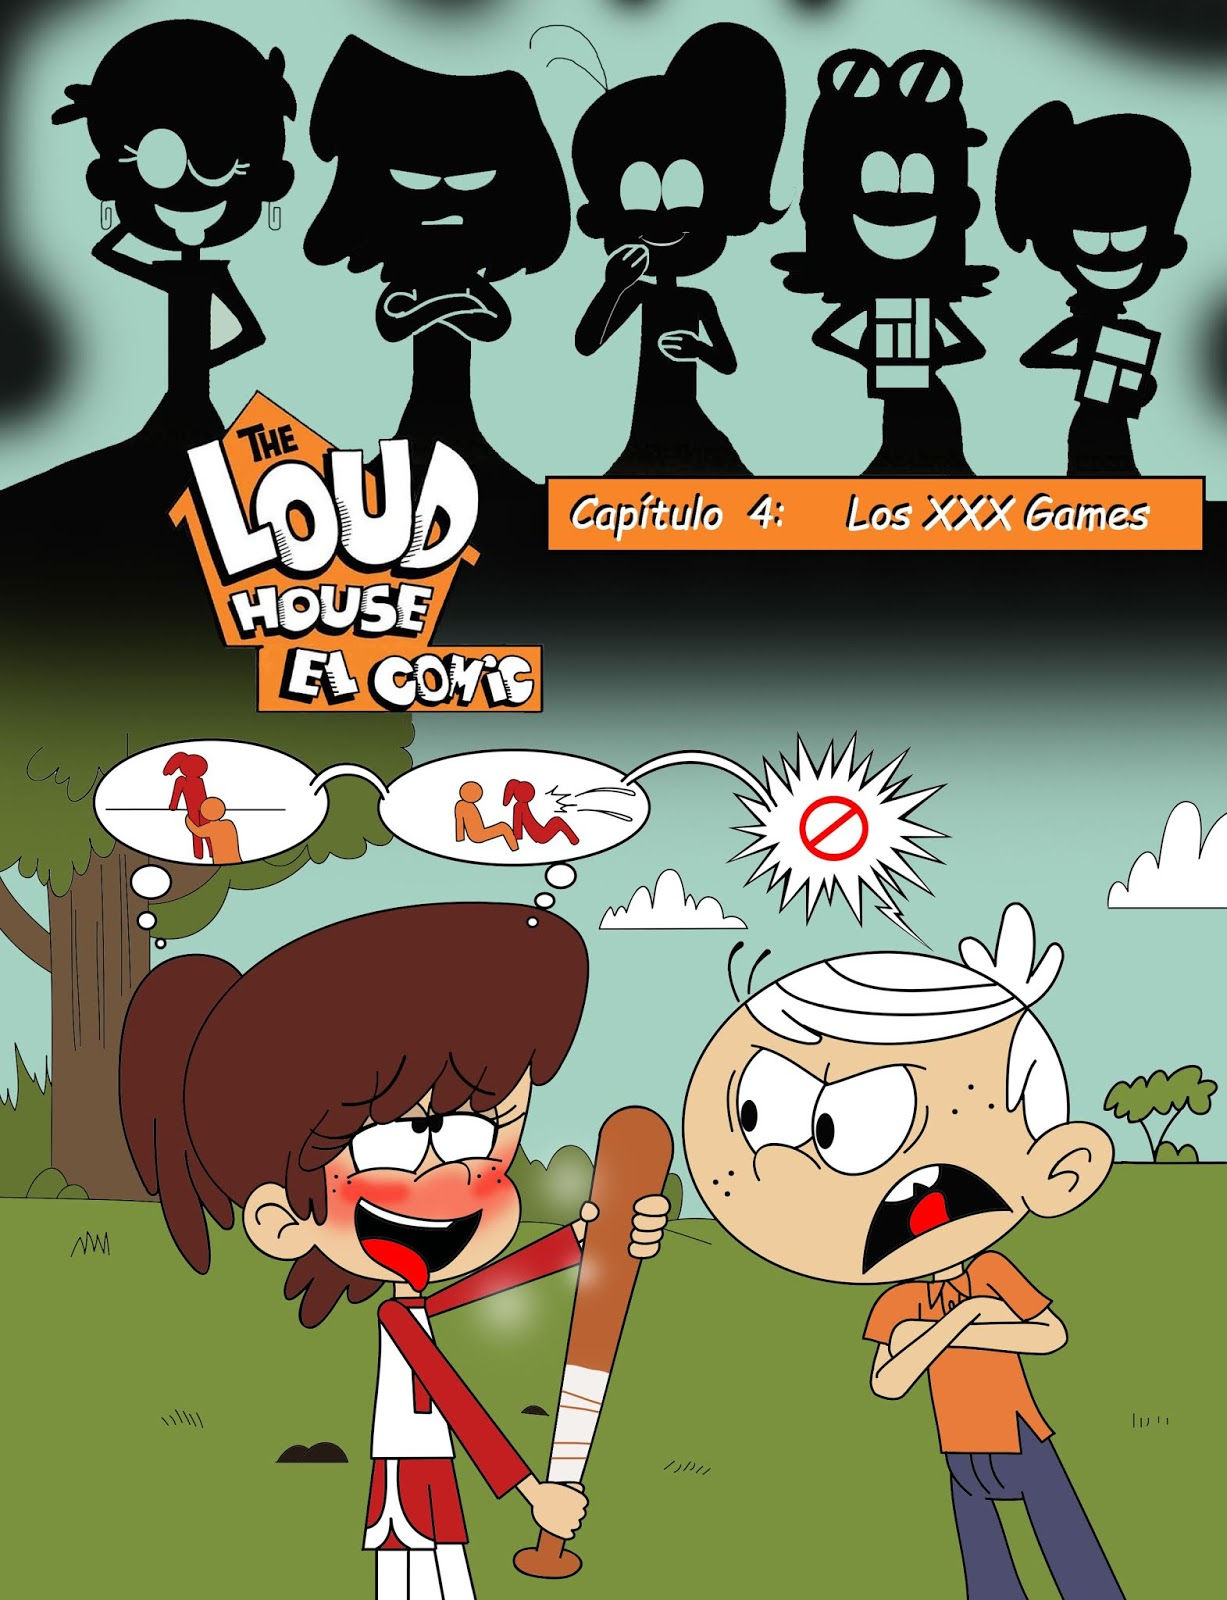 Hijo de Orca: The Loud House: El Comic 4.0 & 4.5